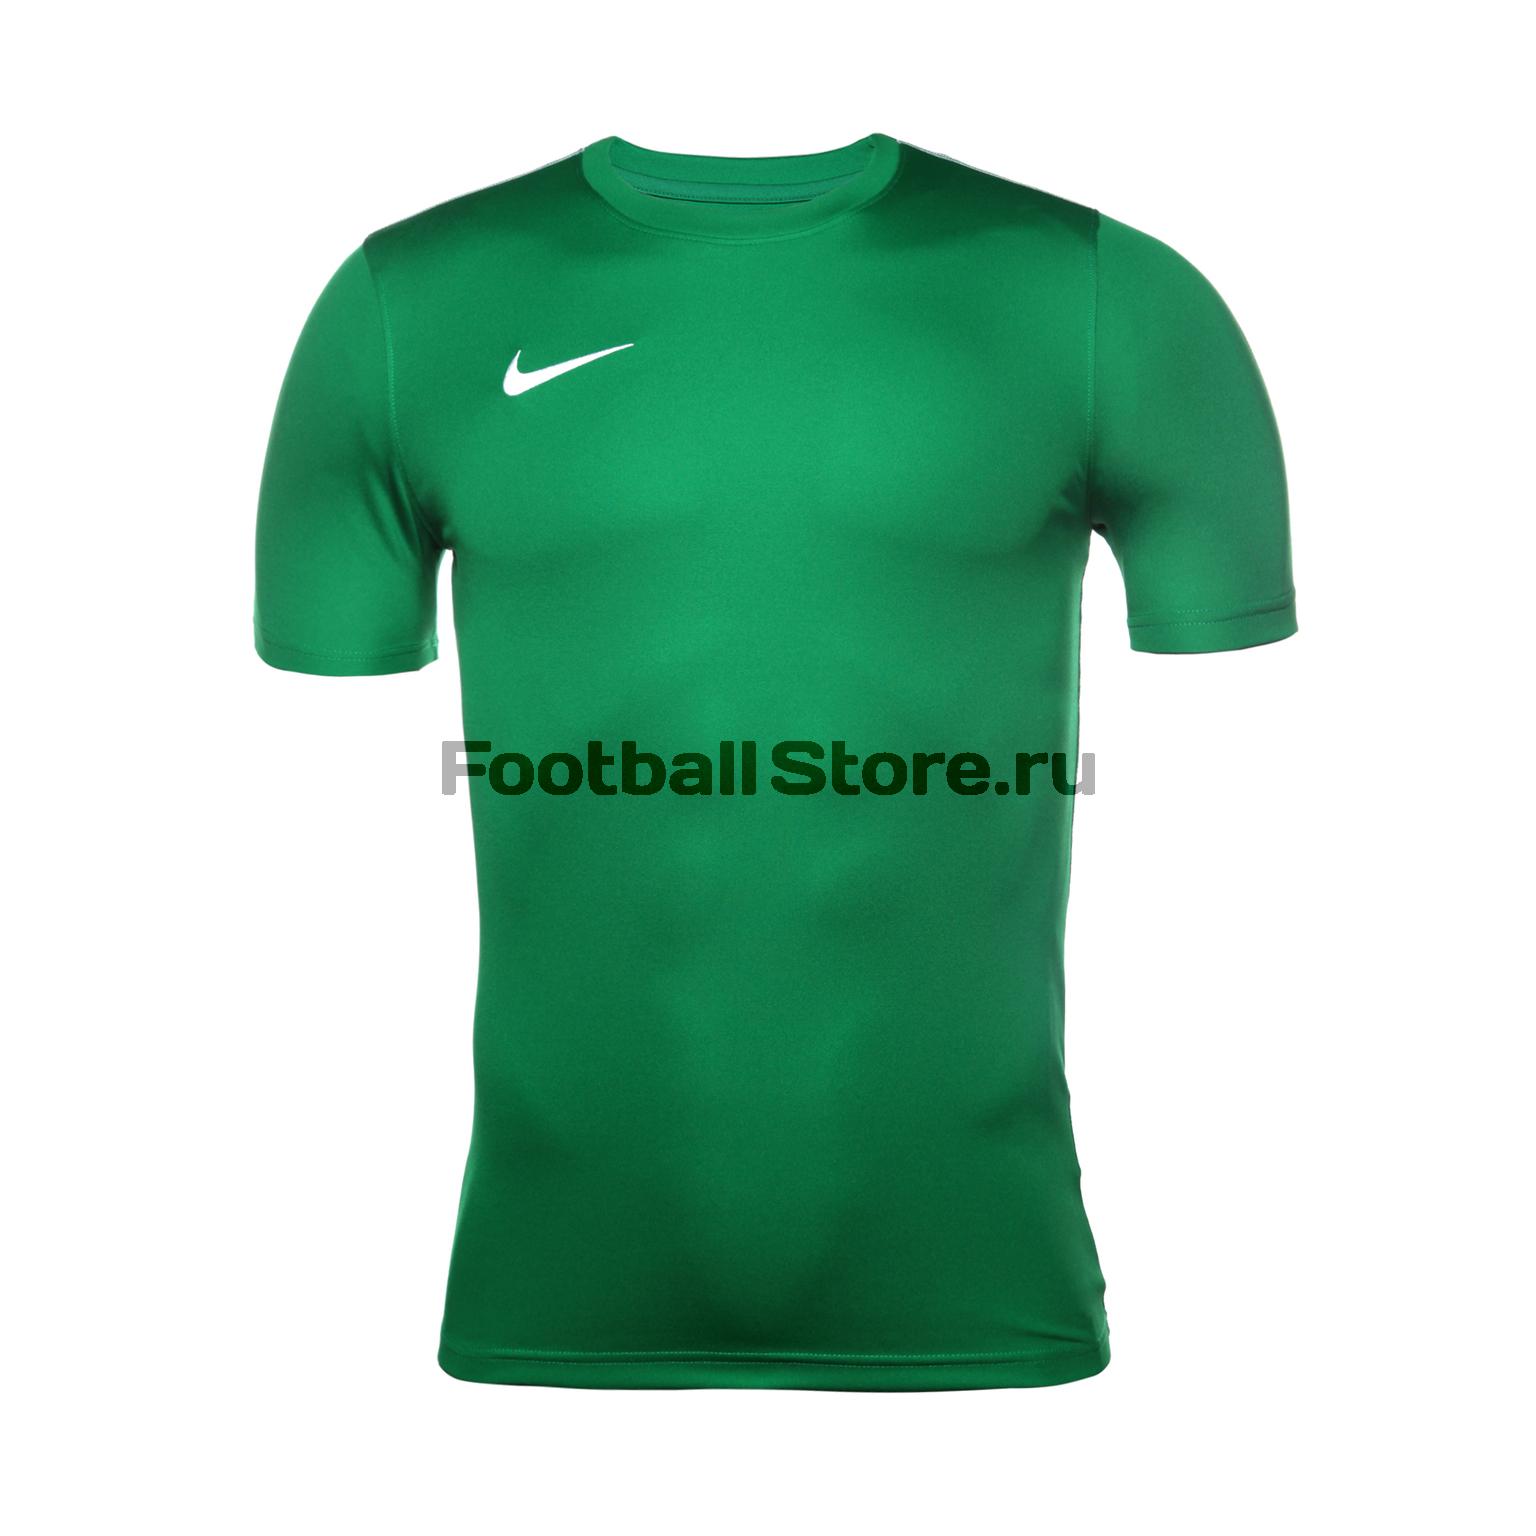 Футболка тренировочная Nike Dry Park18 SS Top AA2046-302 футболка игровая nike dry tiempo prem jsy ss 894230 411